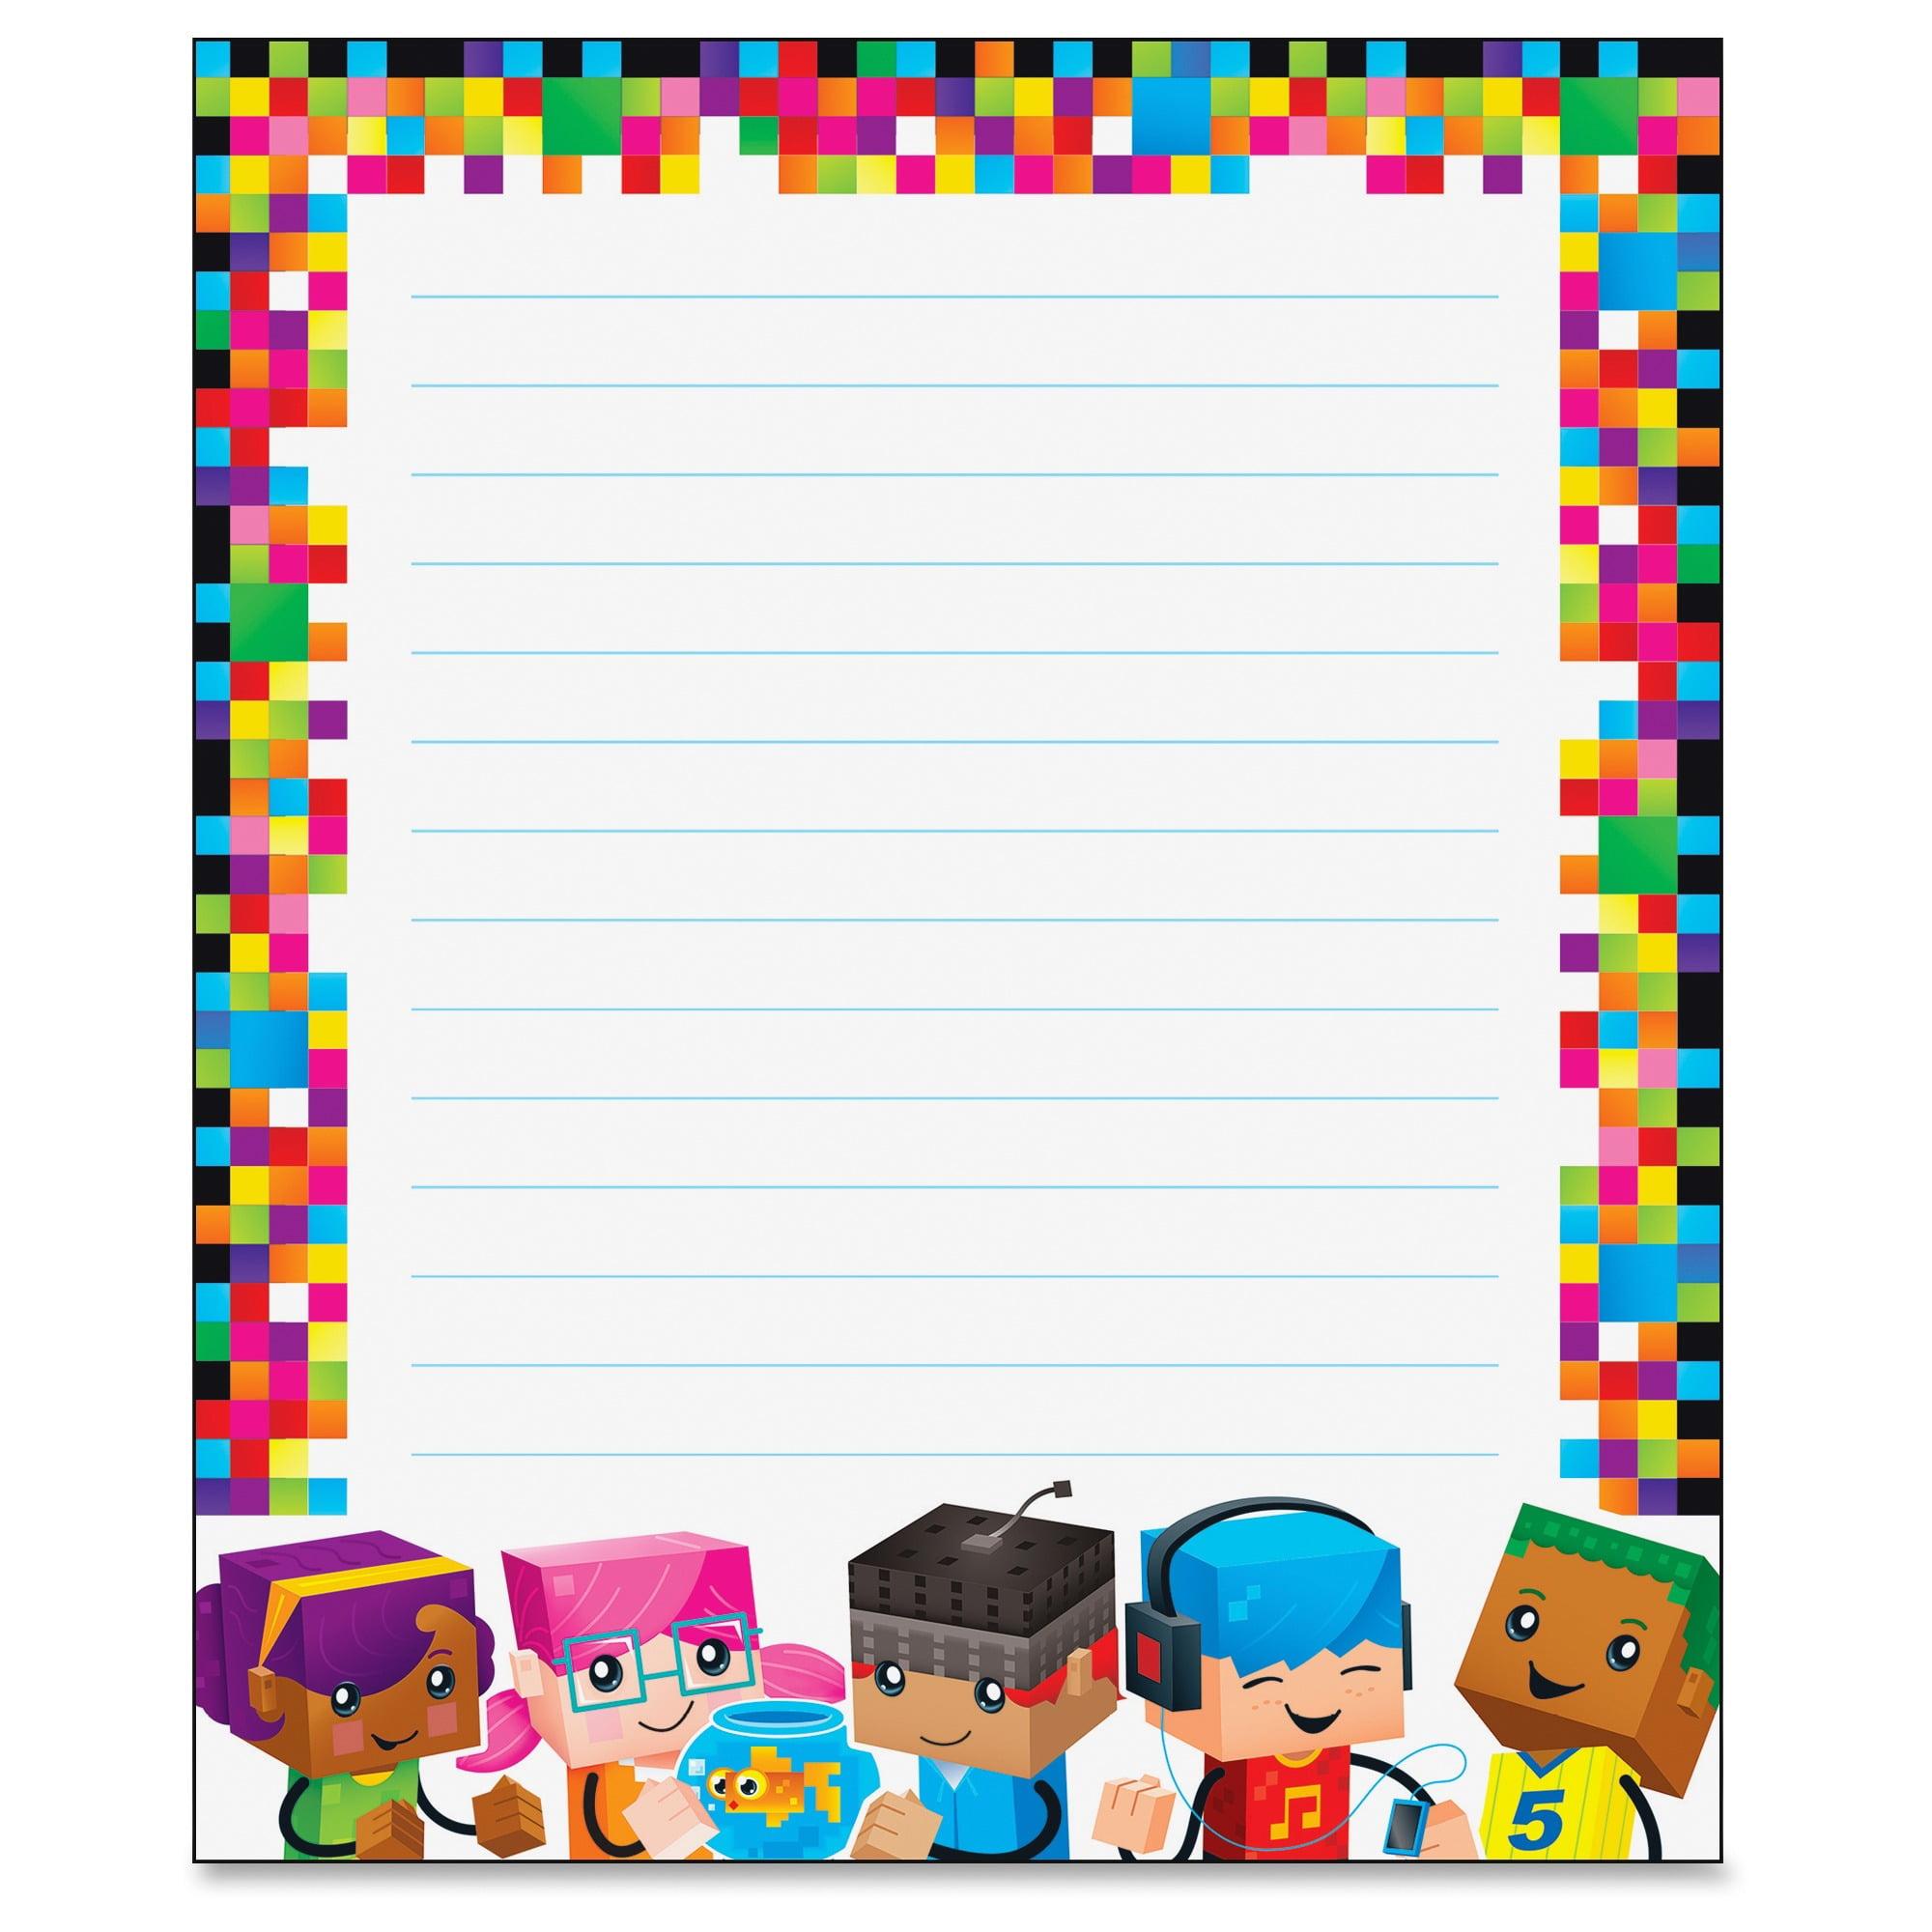 Trend Blockstars Rectangle Notepad 50 Sheets Printed